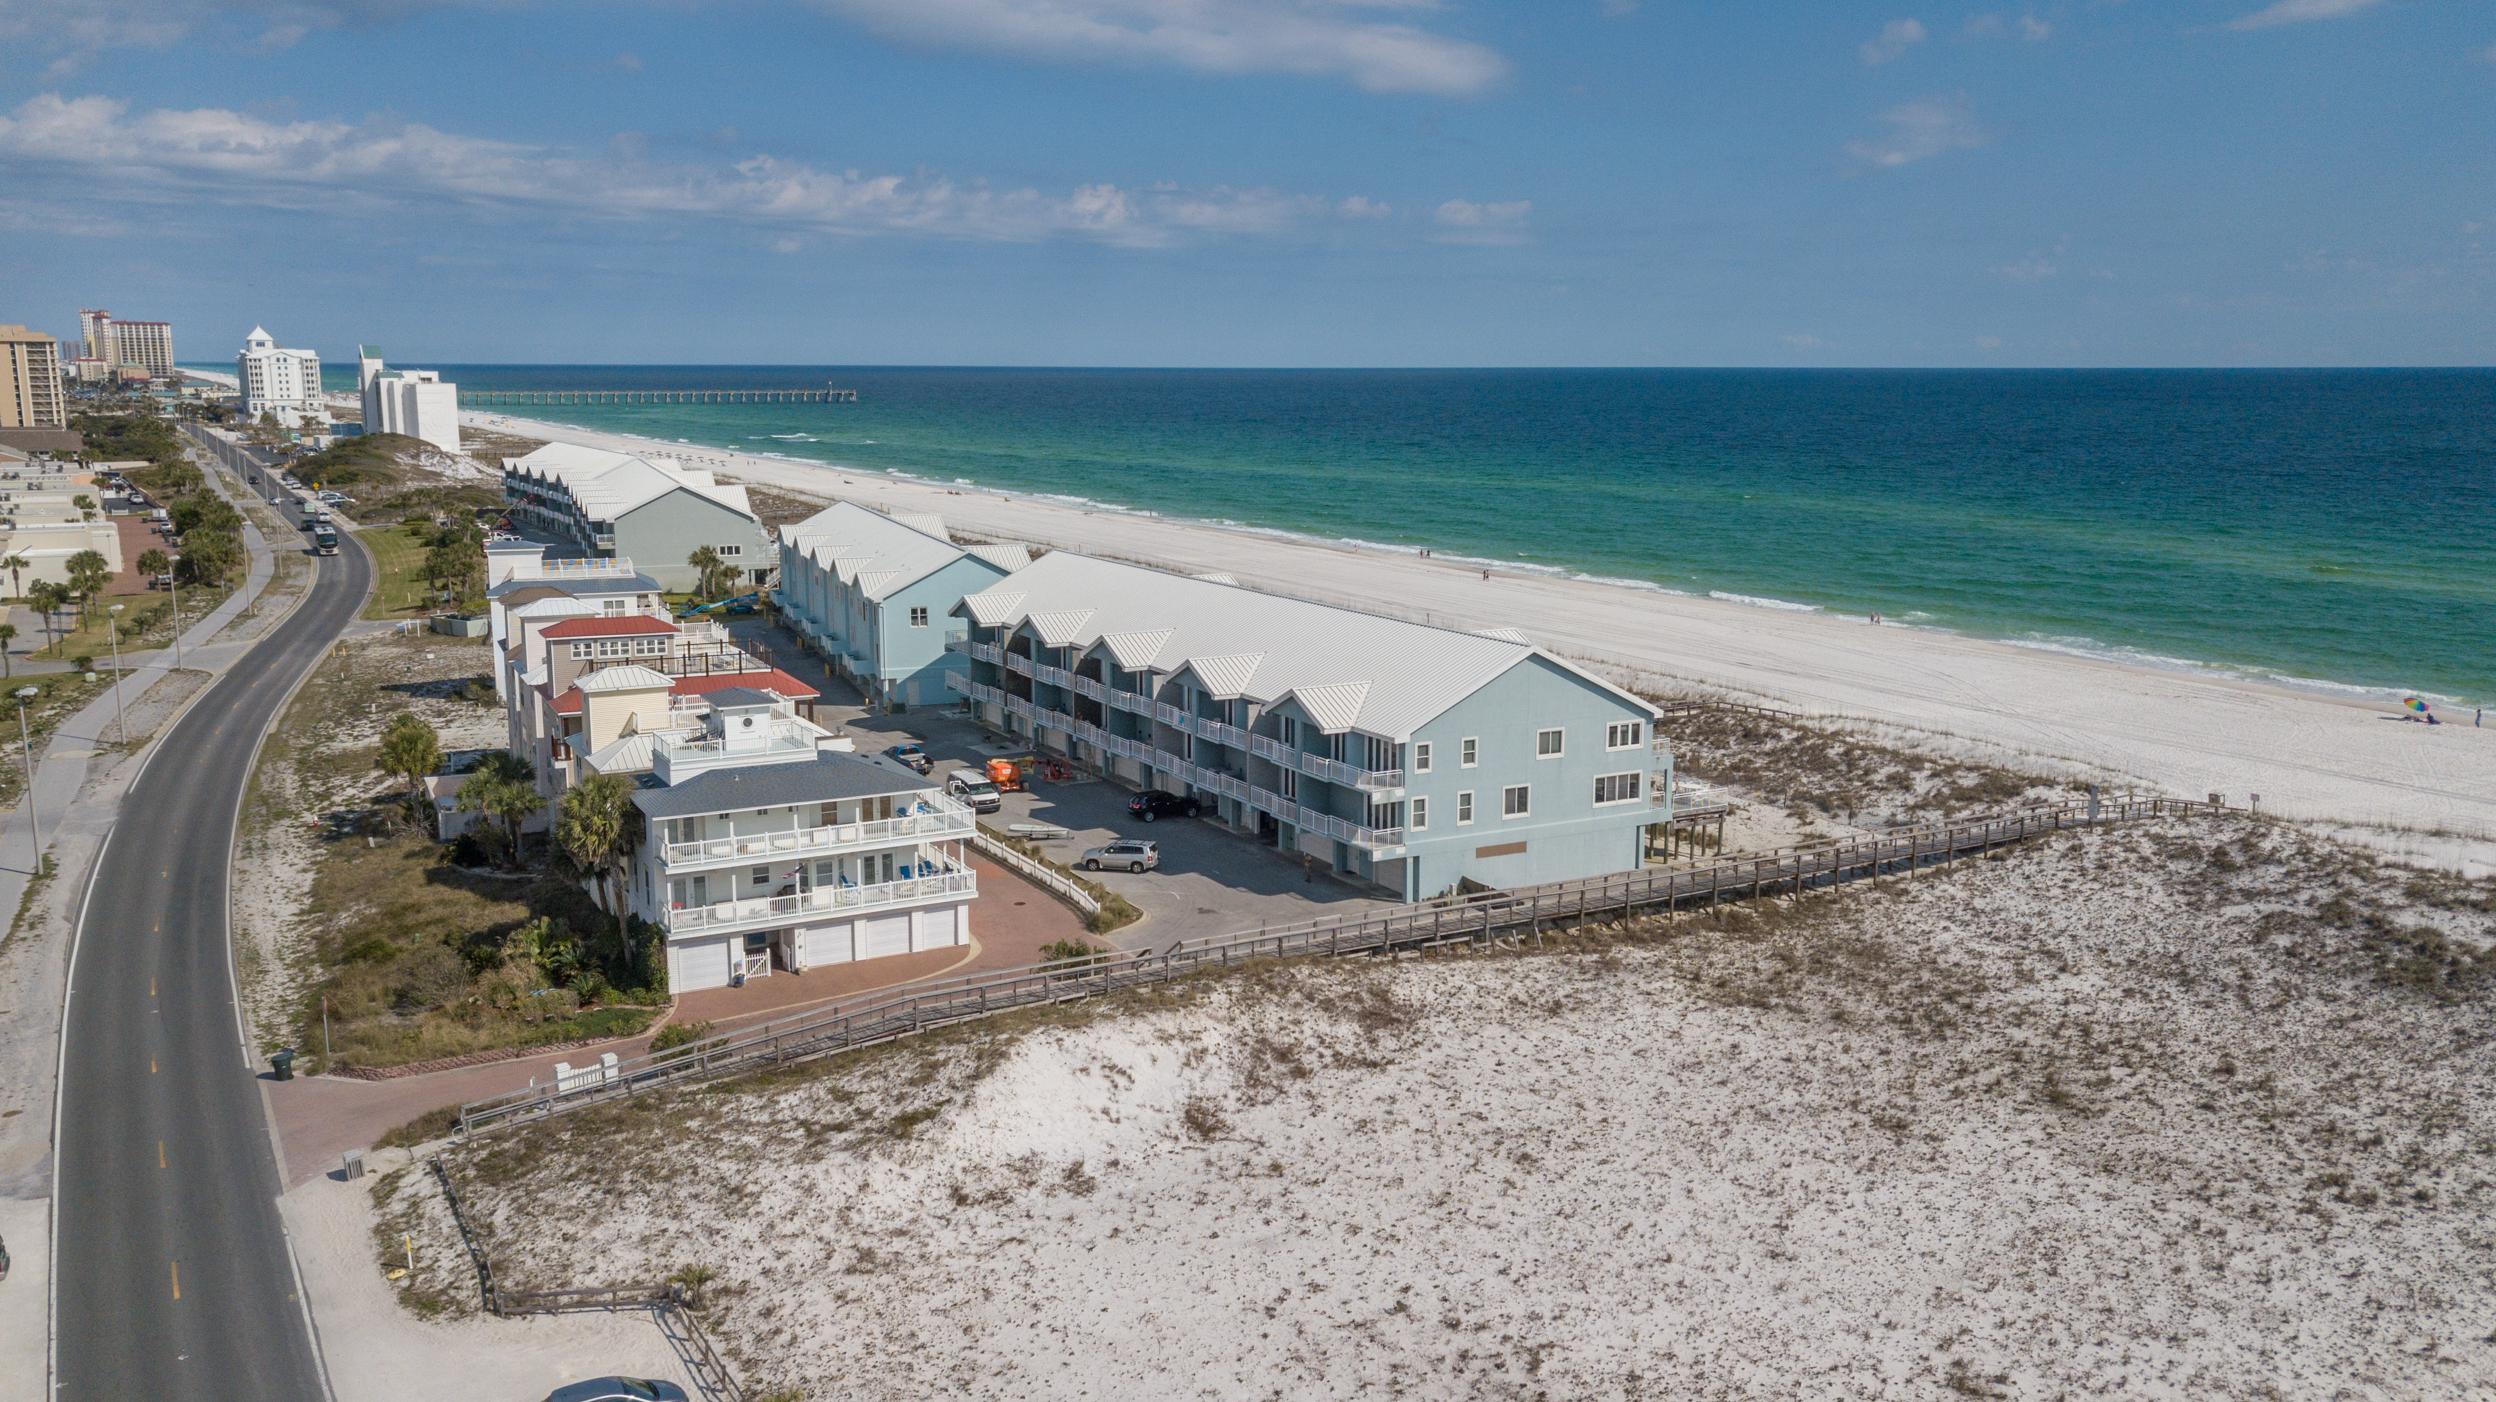 White Sands Cottage 501 Life's a Beach House Townhouse rental in White Sands Pensacola Beach in Pensacola Beach Florida - #52